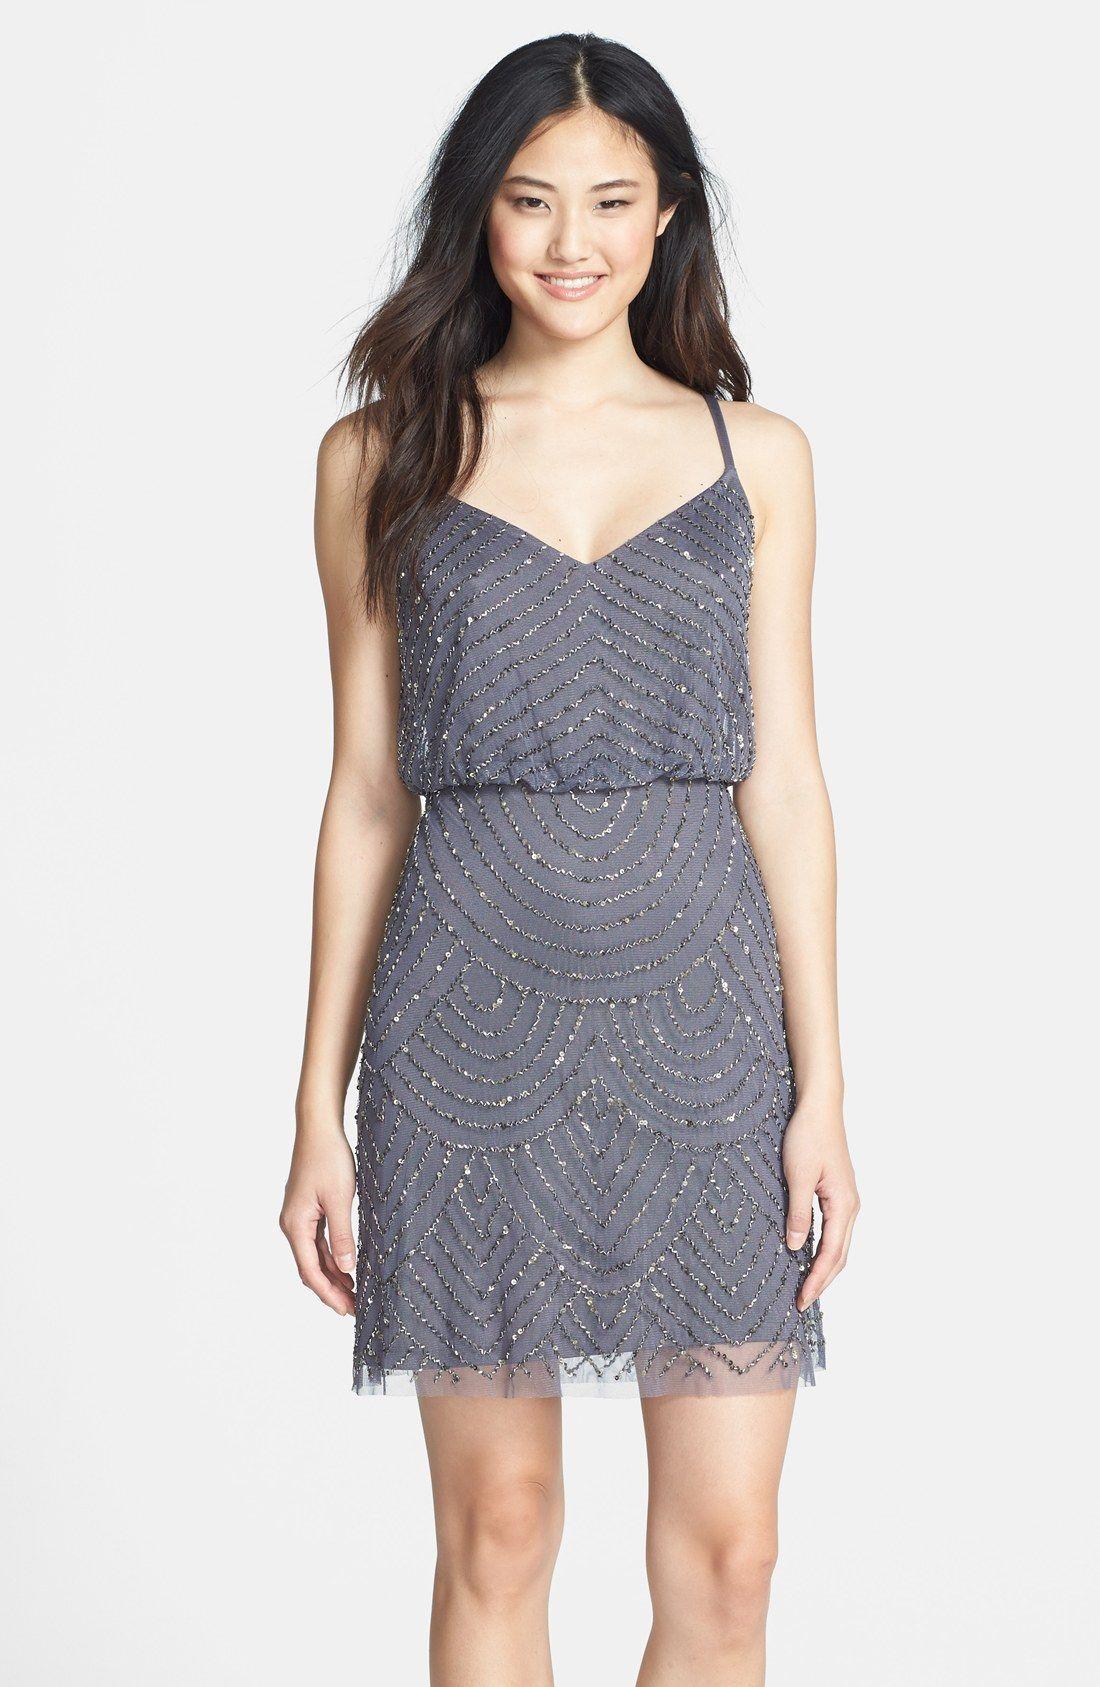 Chloe adrianna papell sequin mesh blouson dress regular u petite